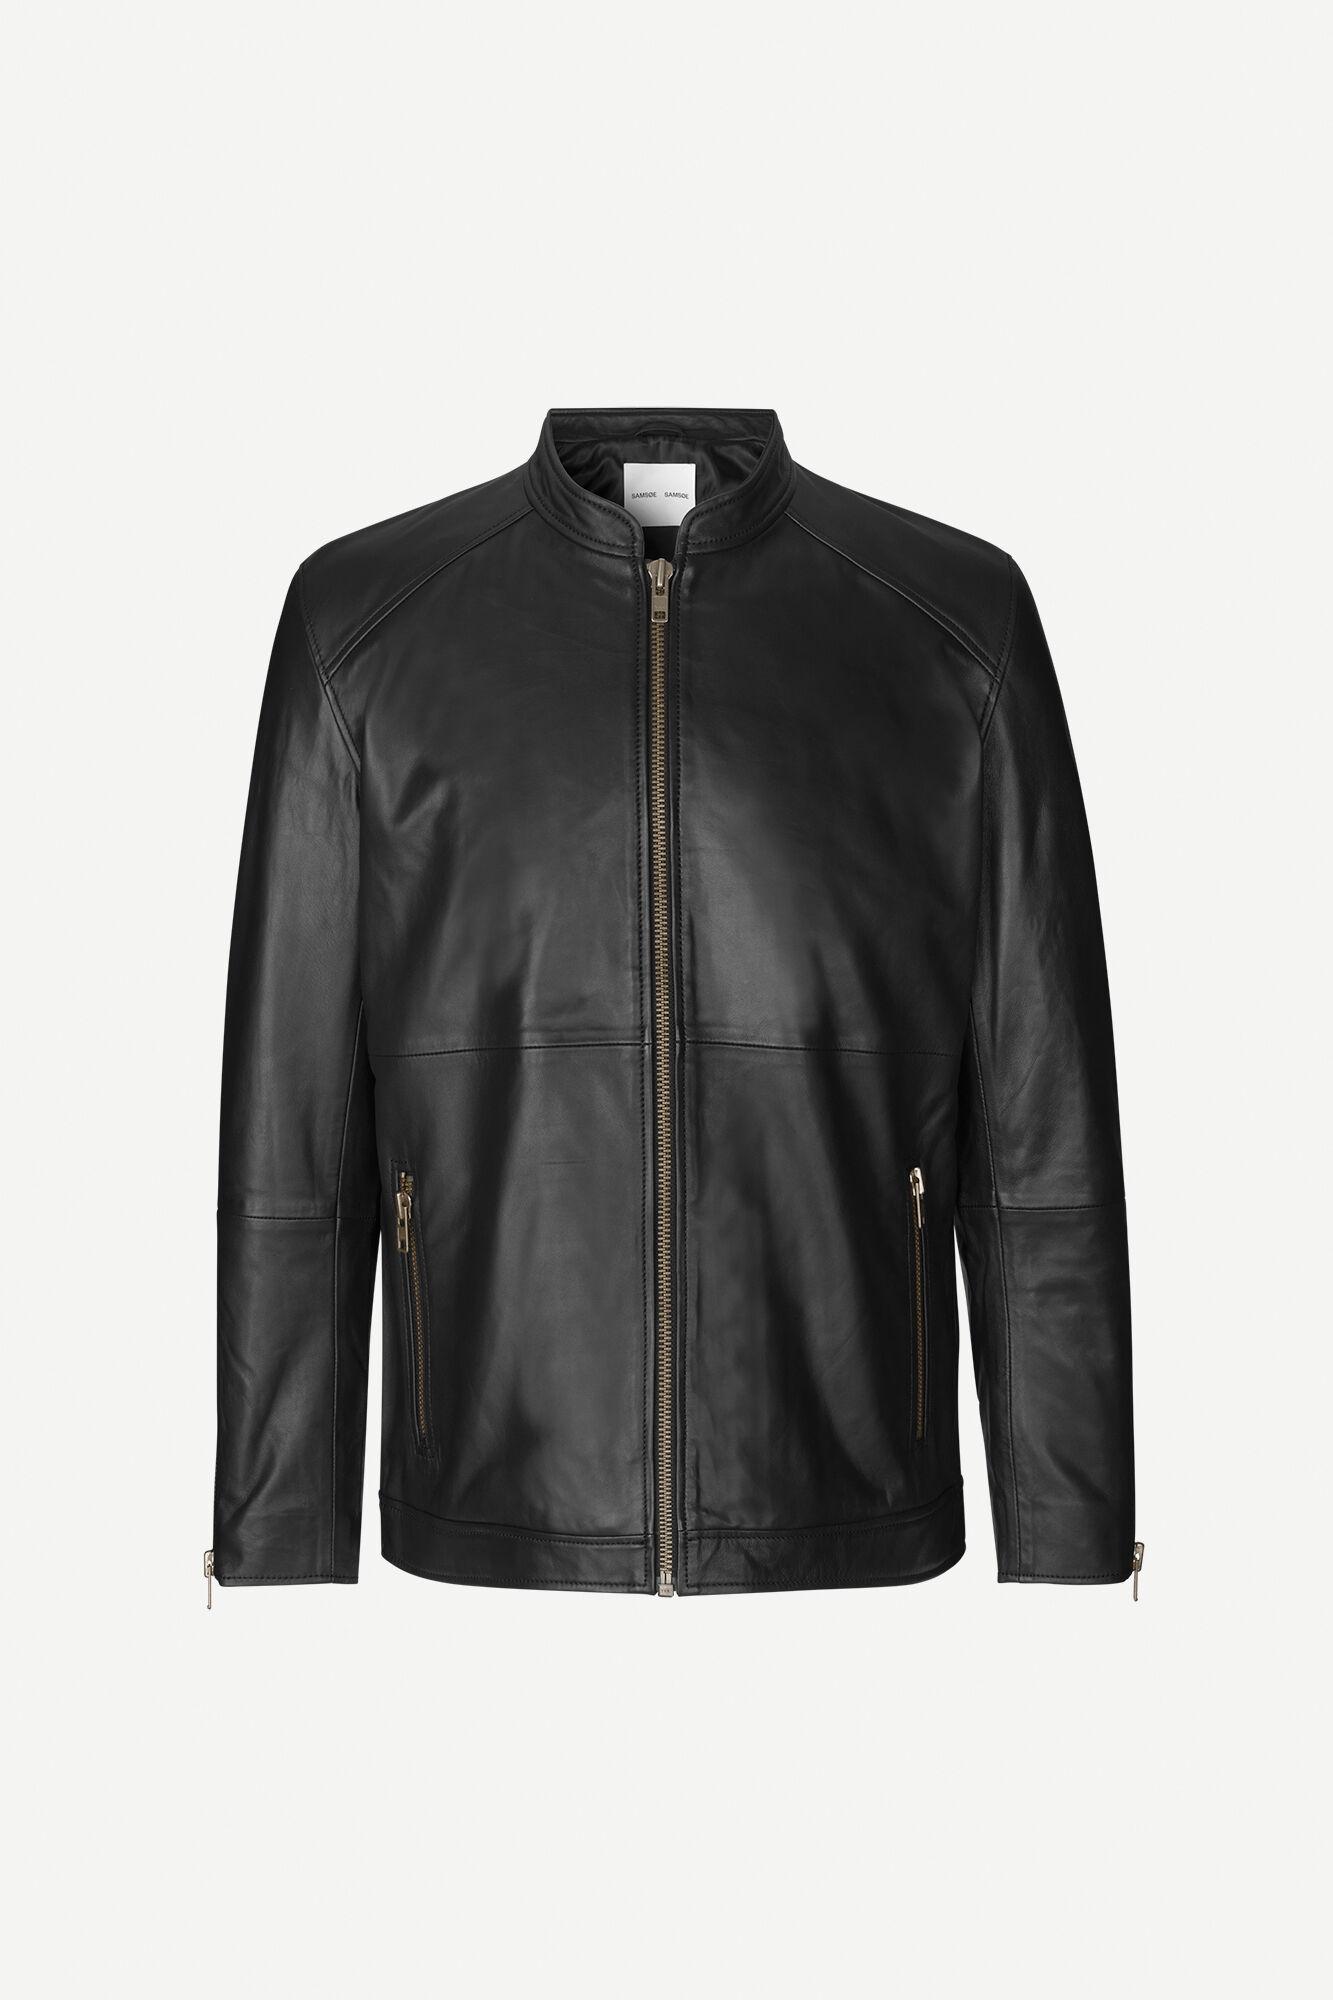 Starship jacket 1440